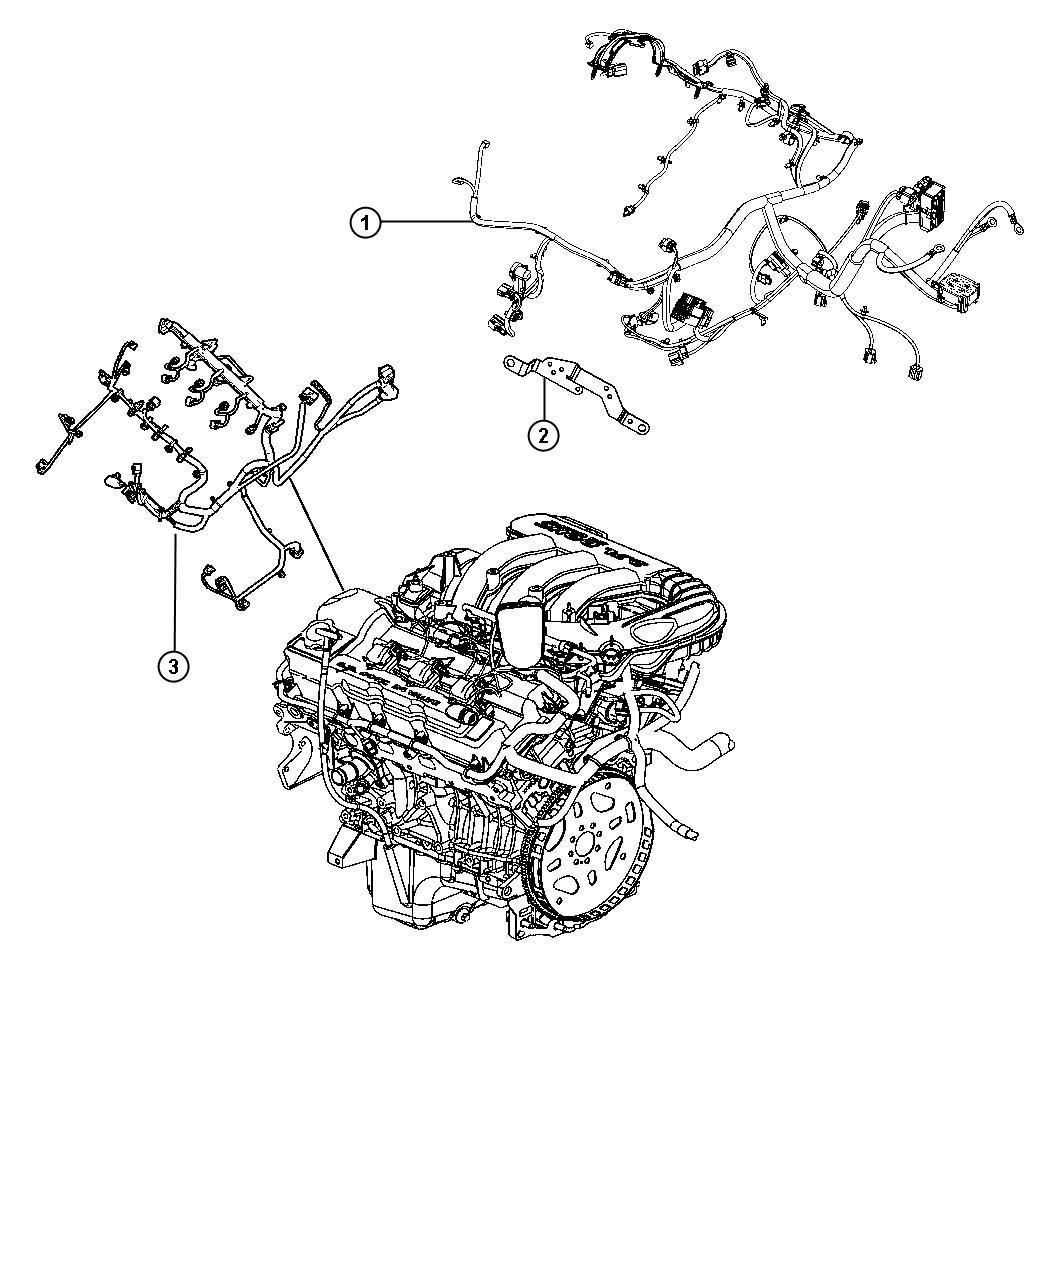 2012 Dodge Journey Wiring. Engine. Includes transmission